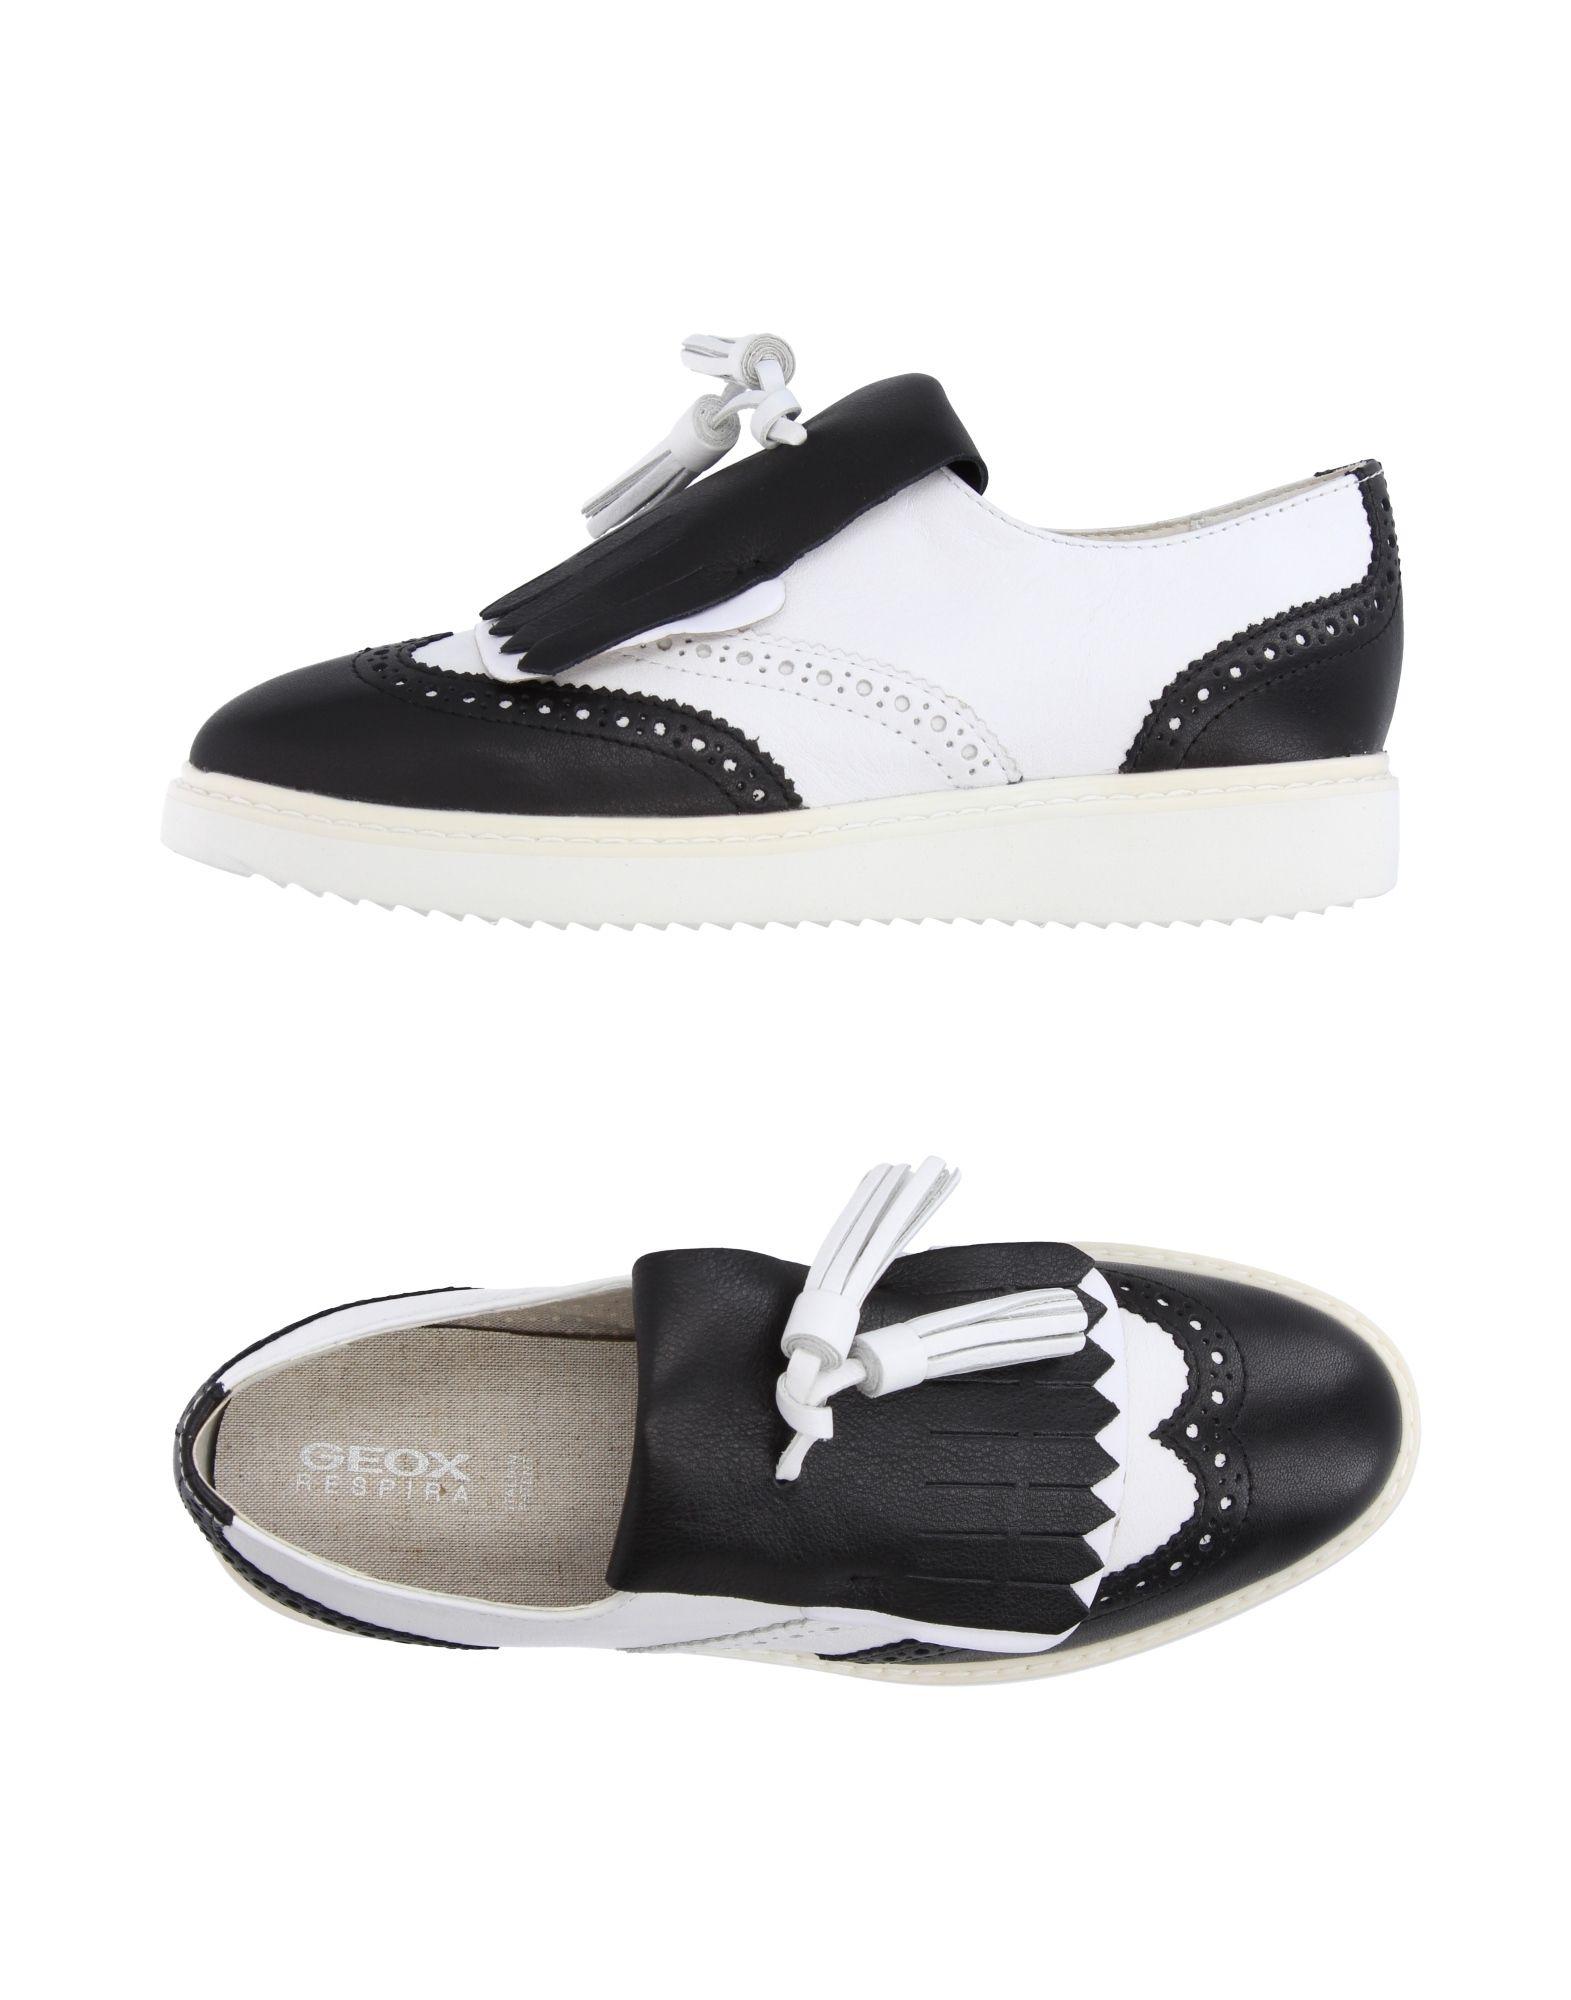 Geox Loafers online - Women Geox Loafers online Loafers on  Australia - 11217847UW 8abe7c